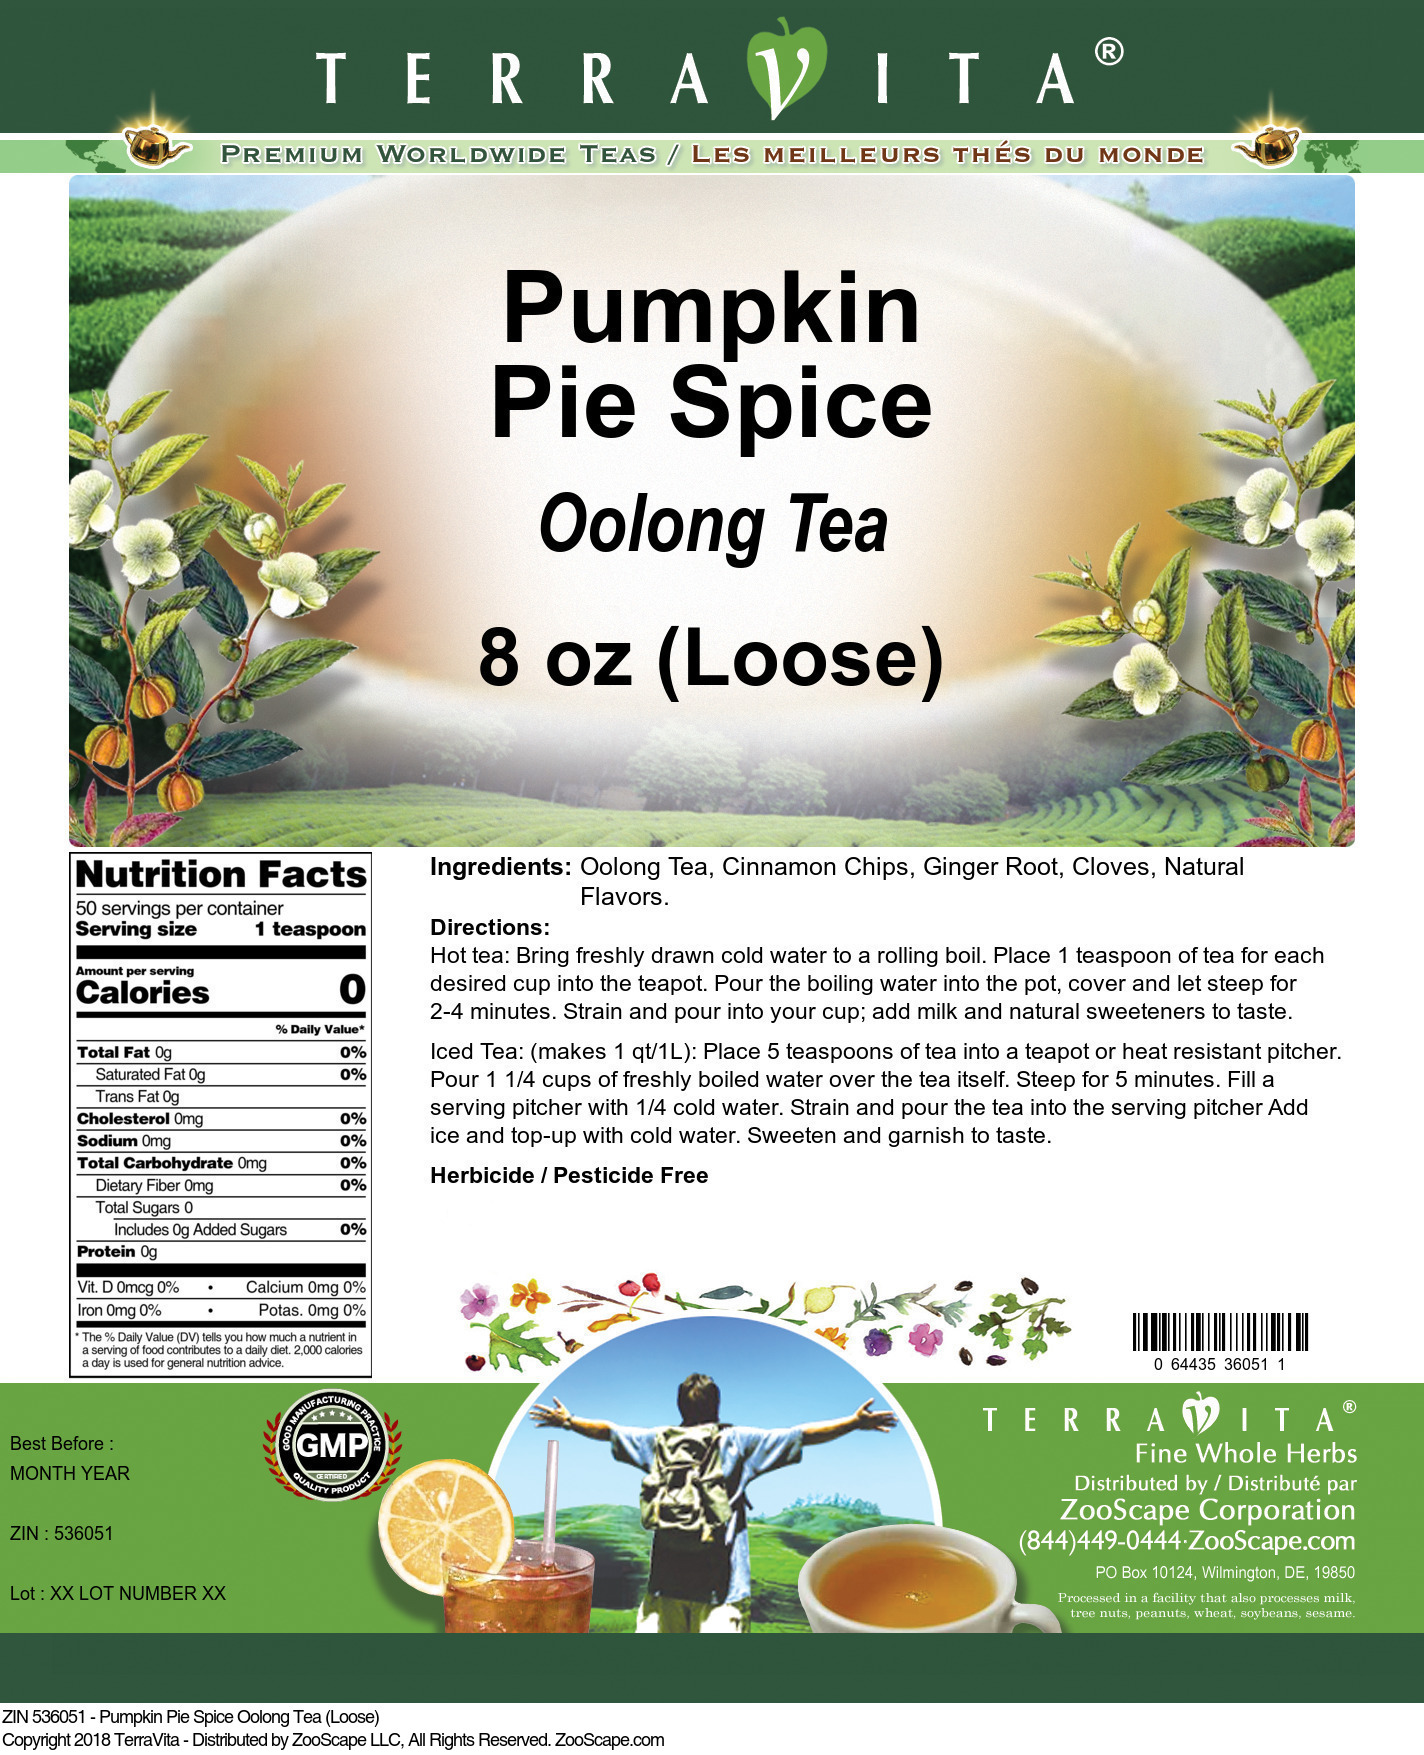 Pumpkin Pie Spice Oolong Tea